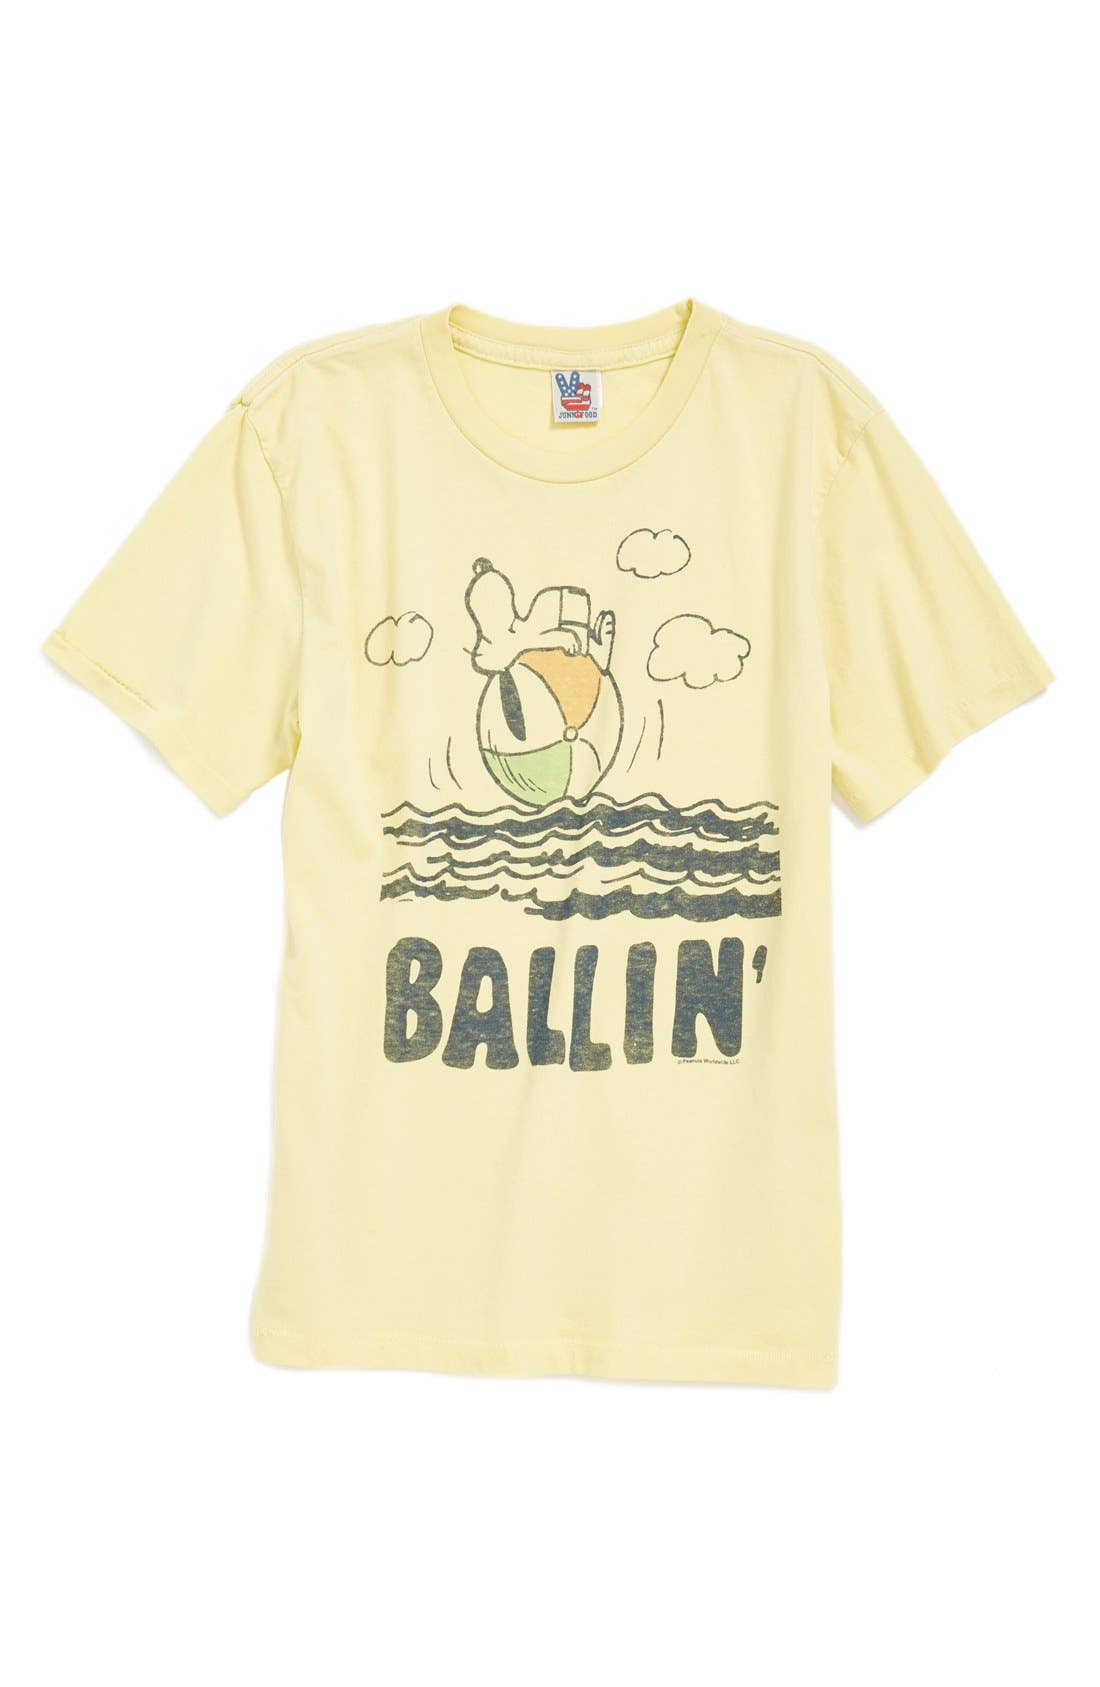 Main Image - Junk Food 'Snoopy Ballin'' Cotton Jersey T-Shirt (Toddler Boys & Little Boys)